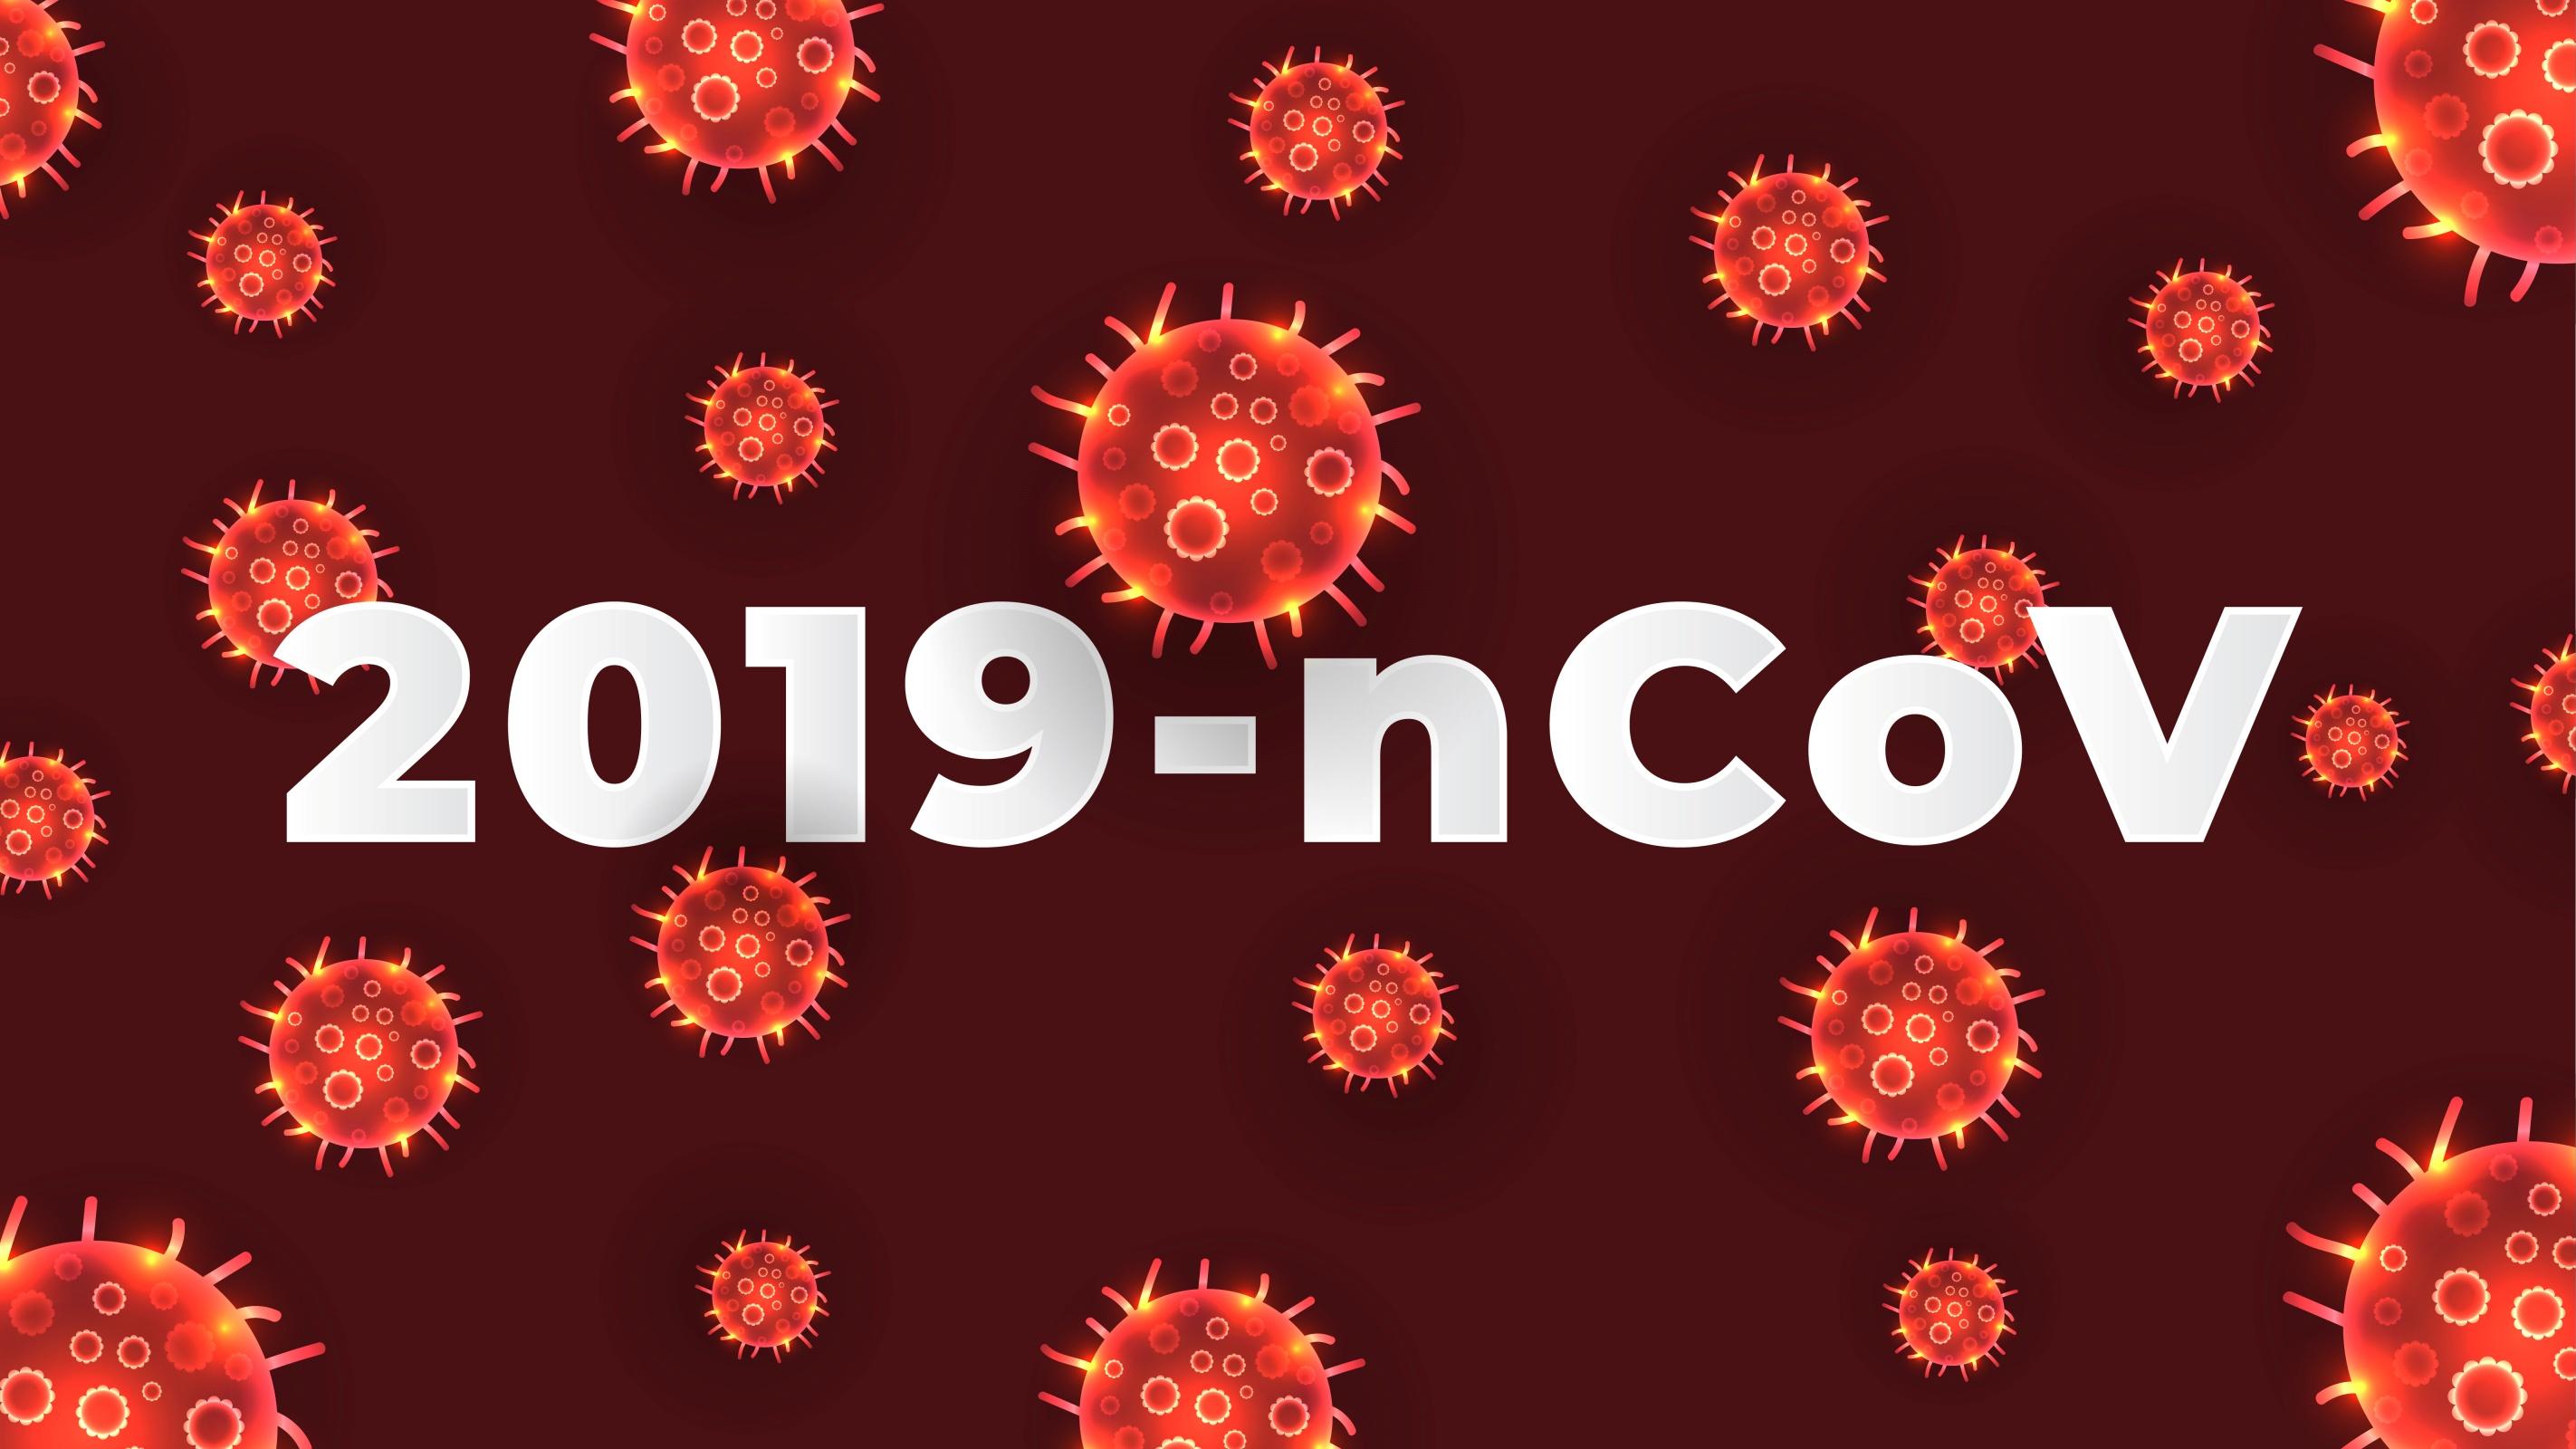 Red Coronavirus COVID-19 Background - Download Free Vectors ...